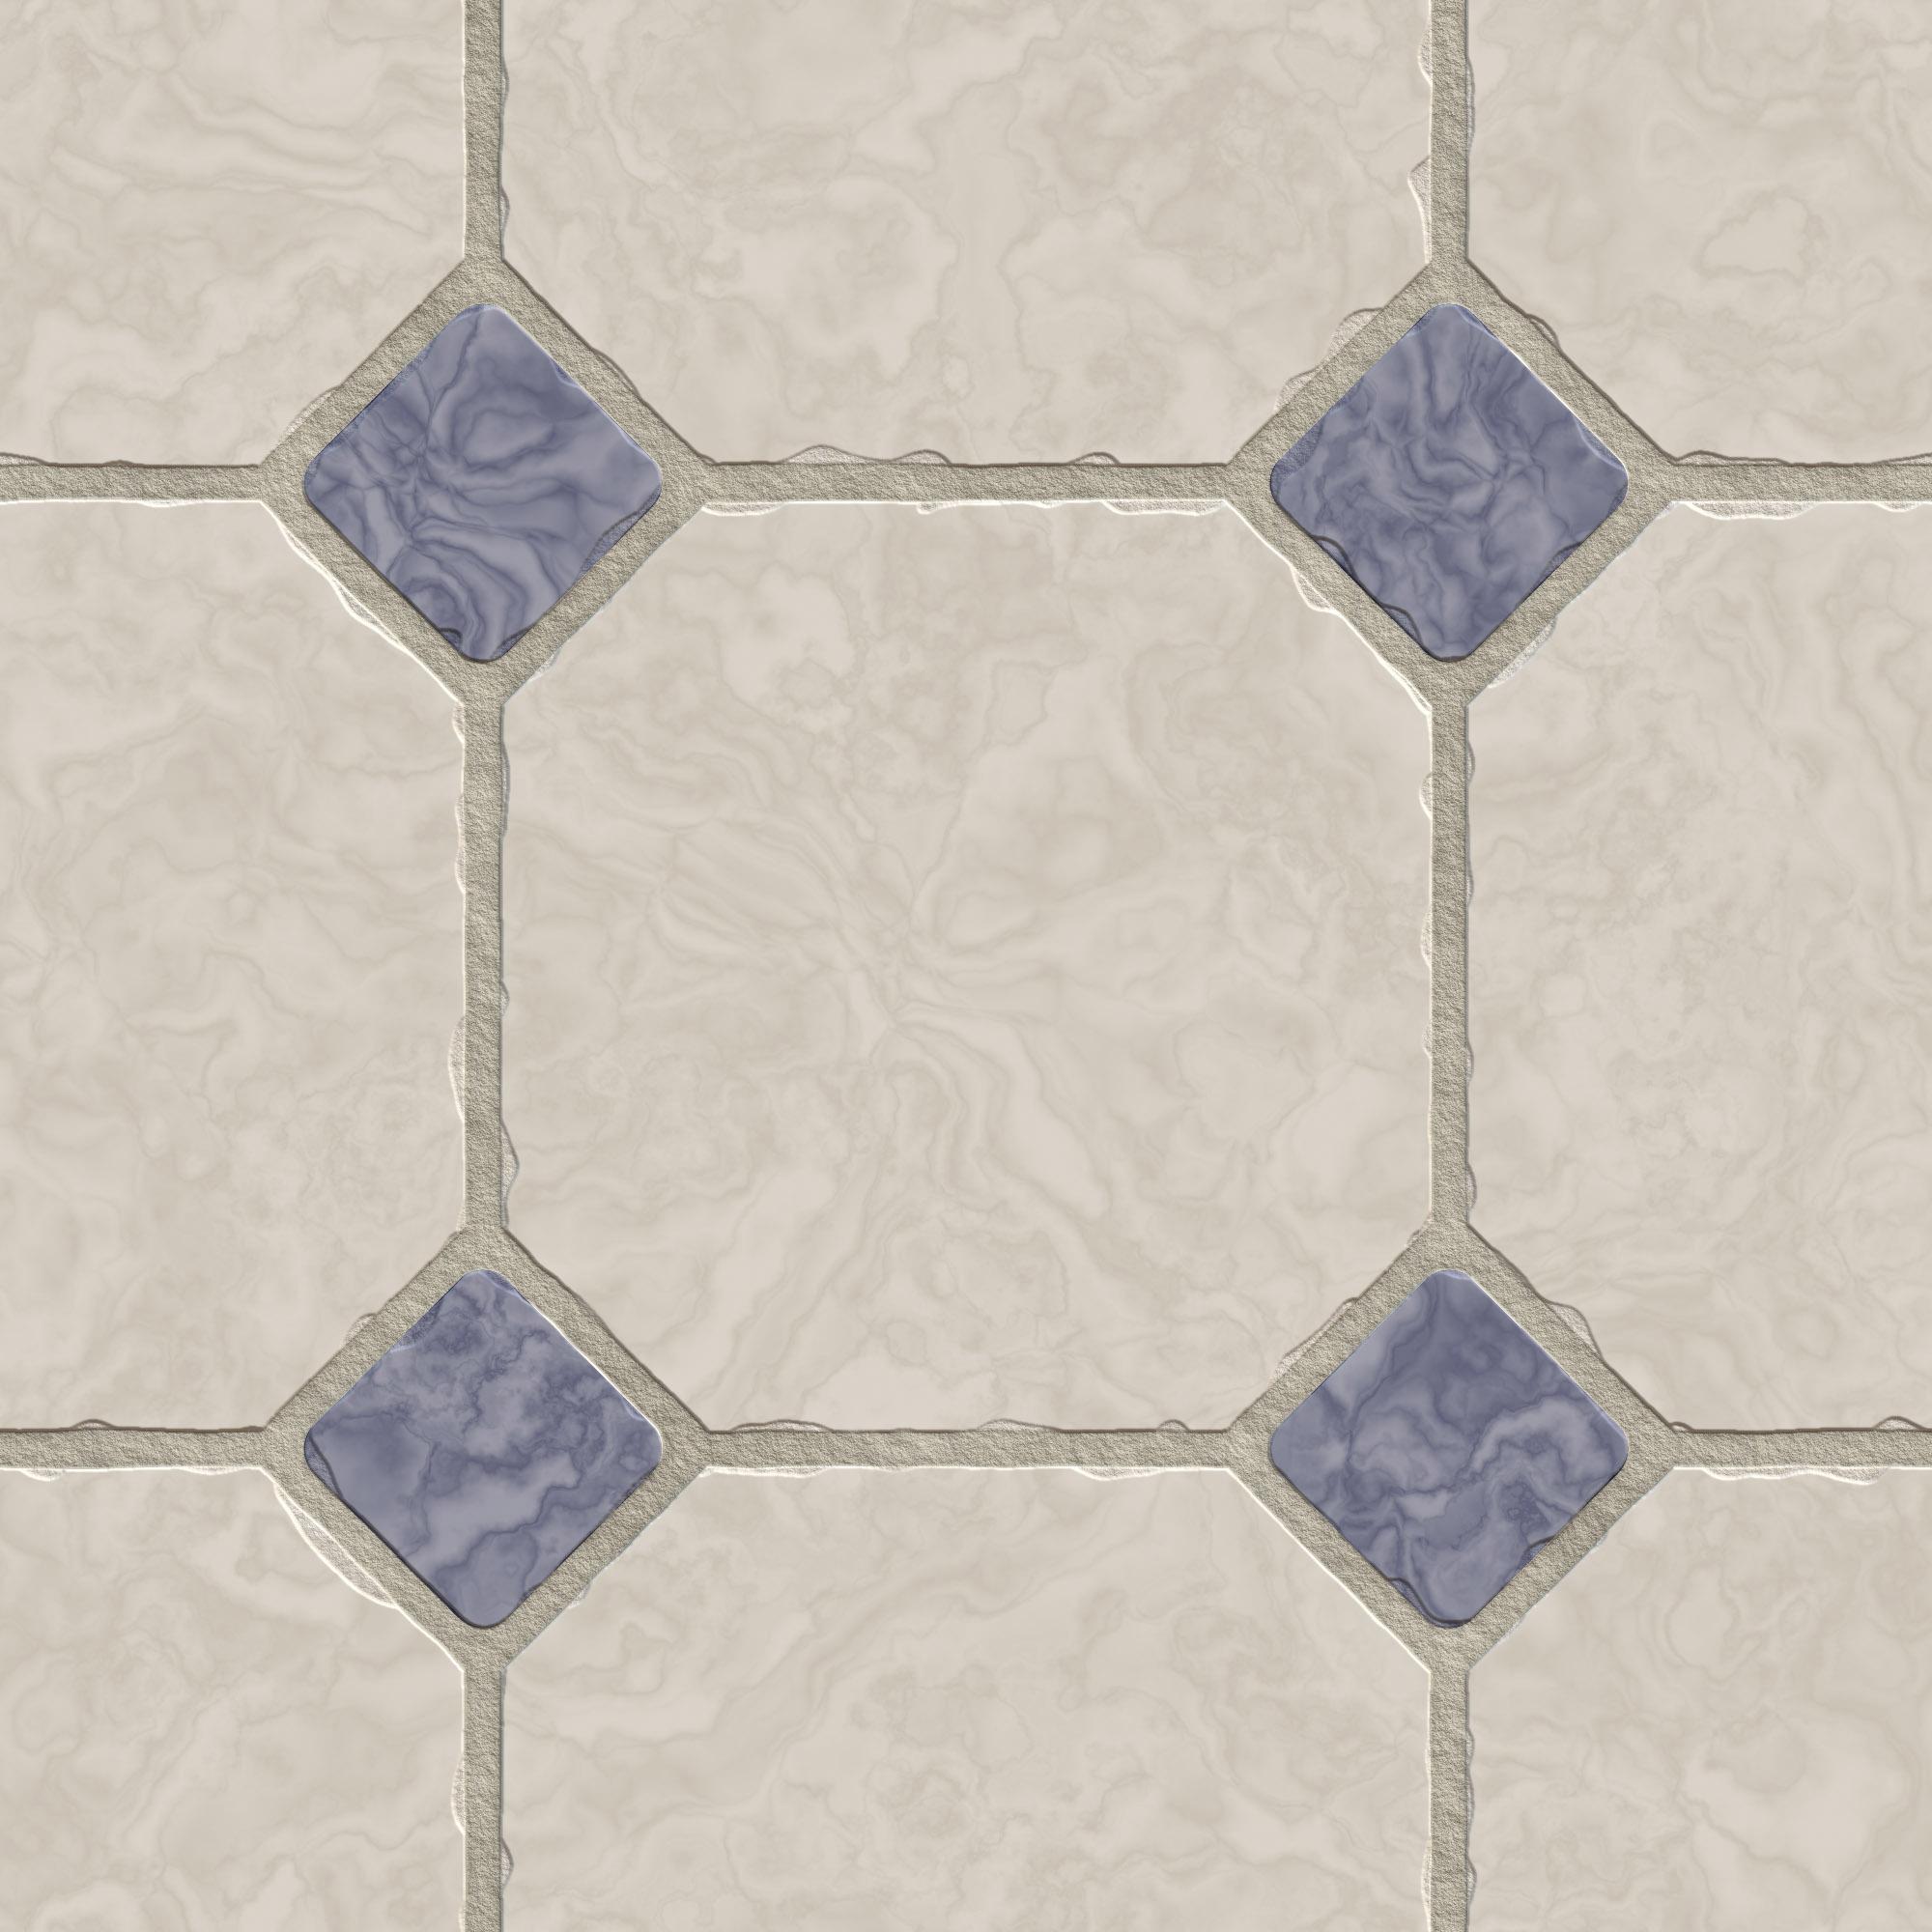 Fantastic seamless floor tile background texture